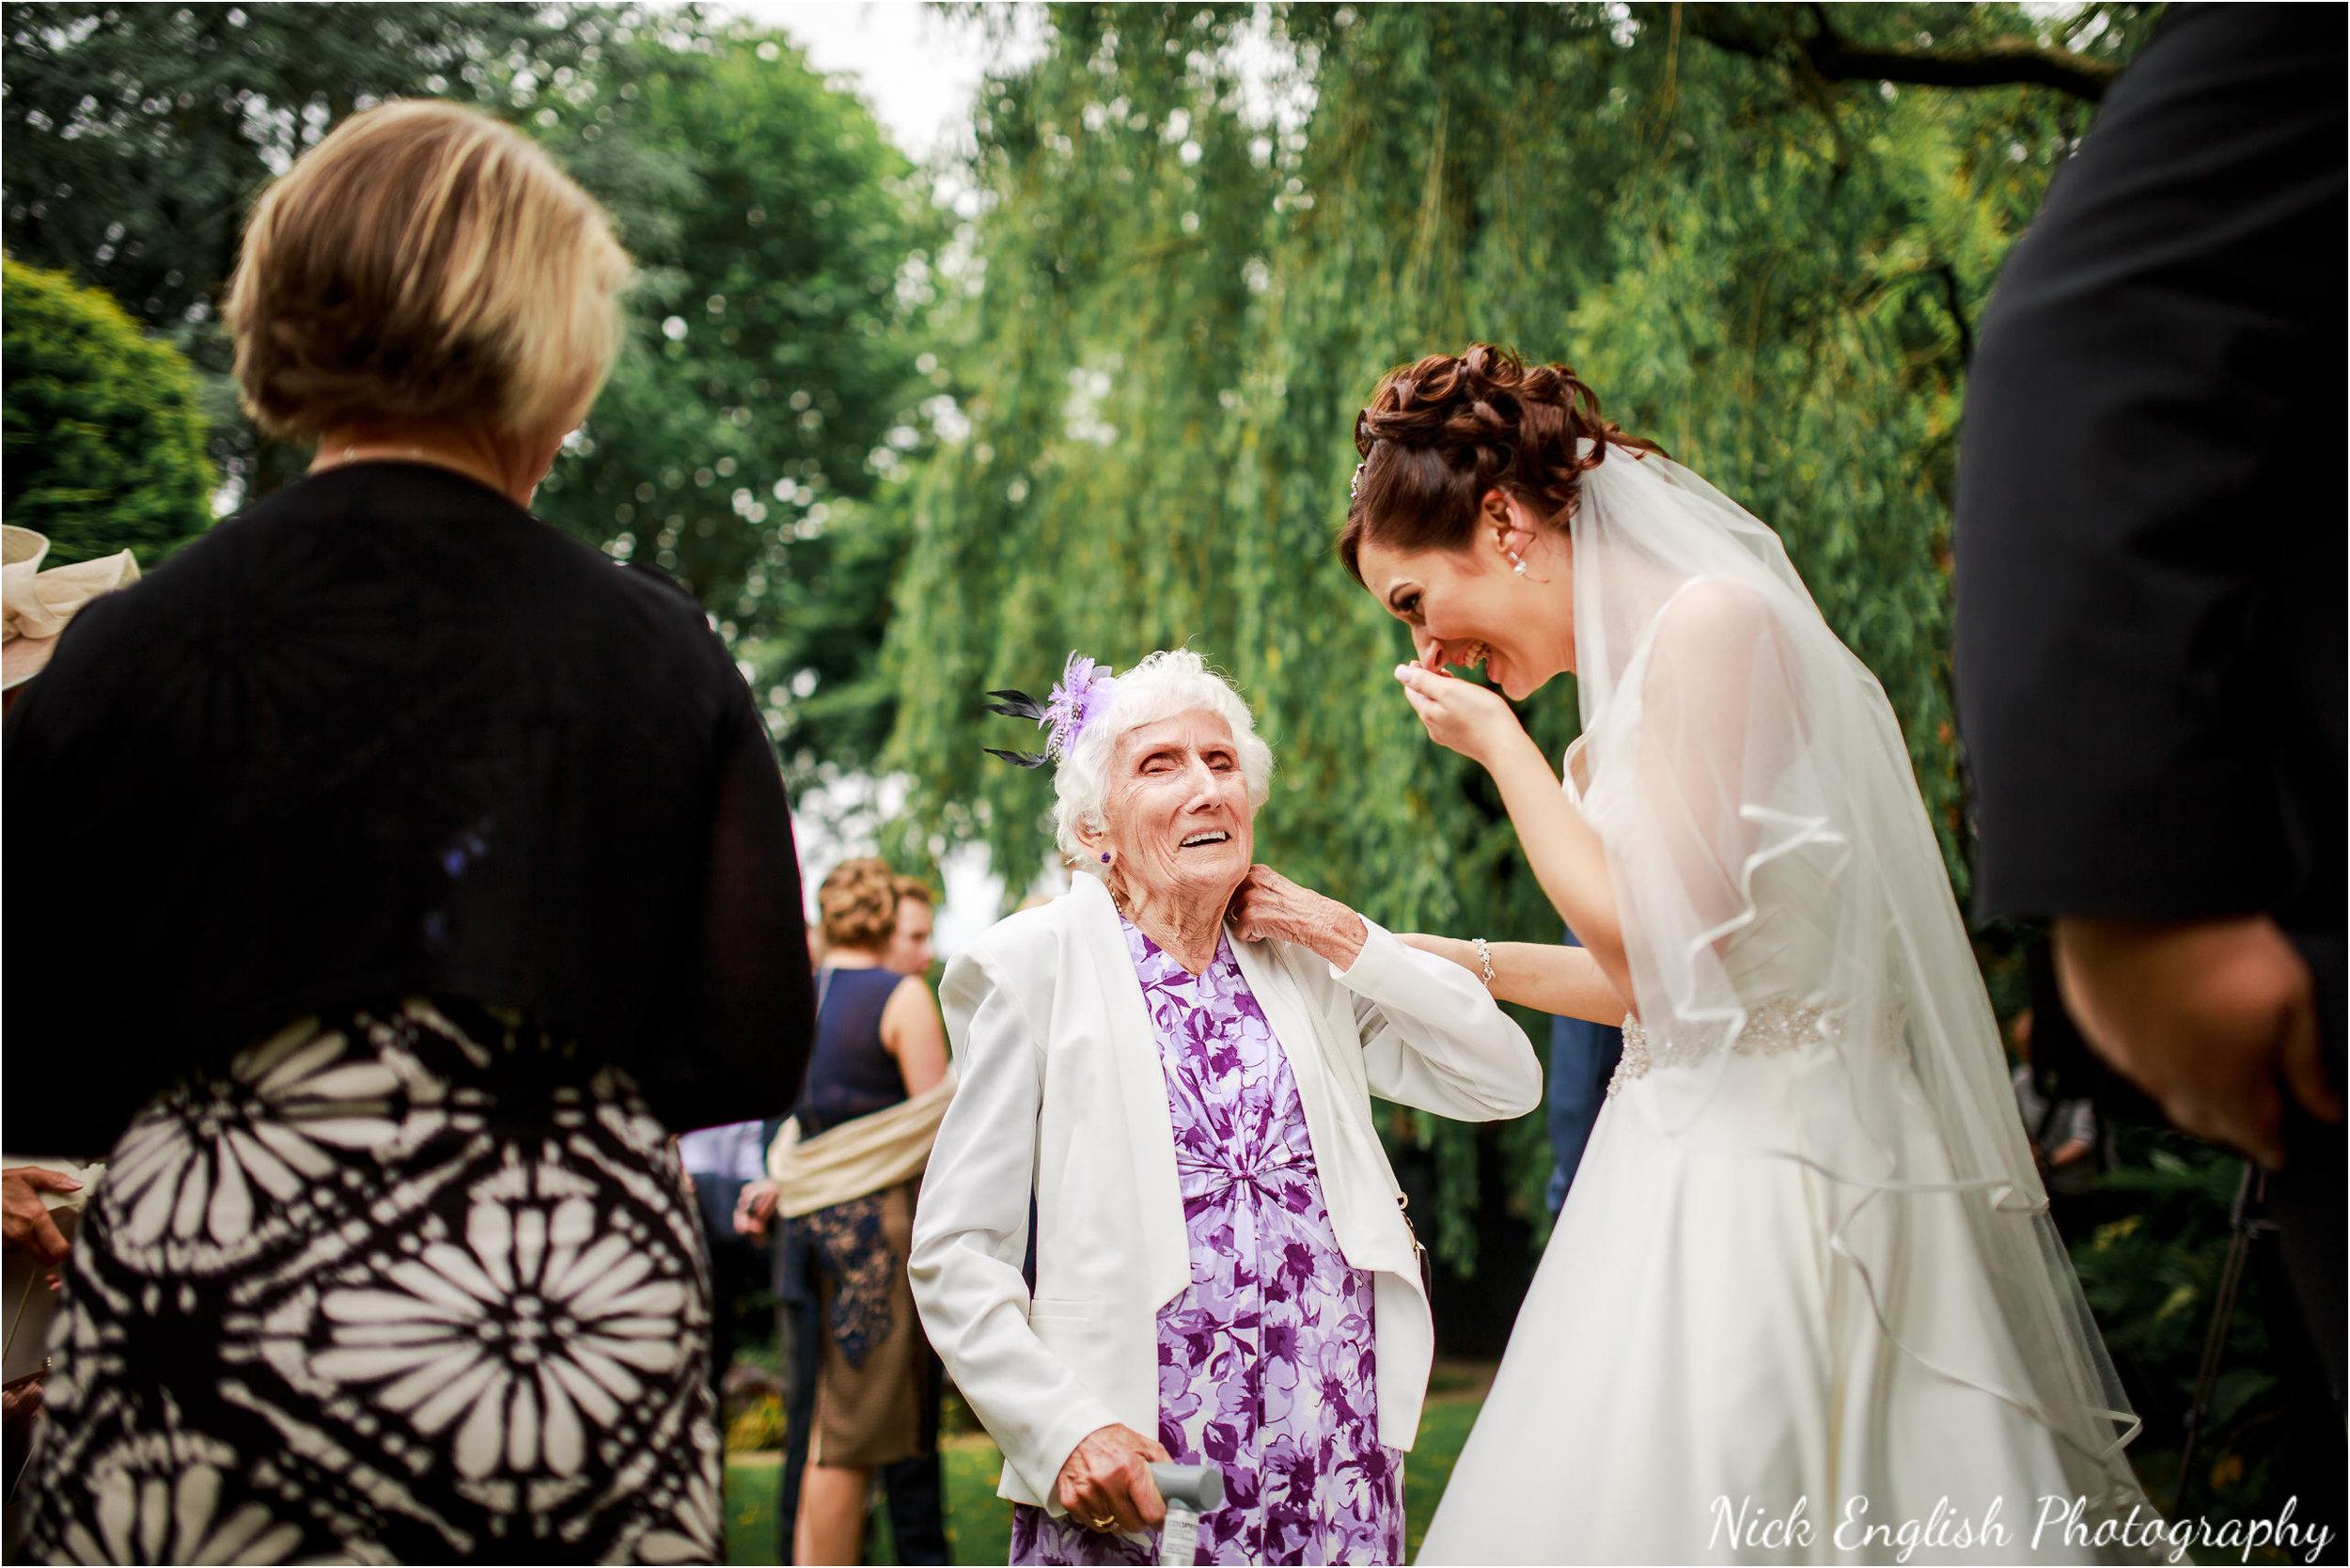 Emily David Wedding Photographs at Barton Grange Preston by Nick English Photography 130jpg.jpeg